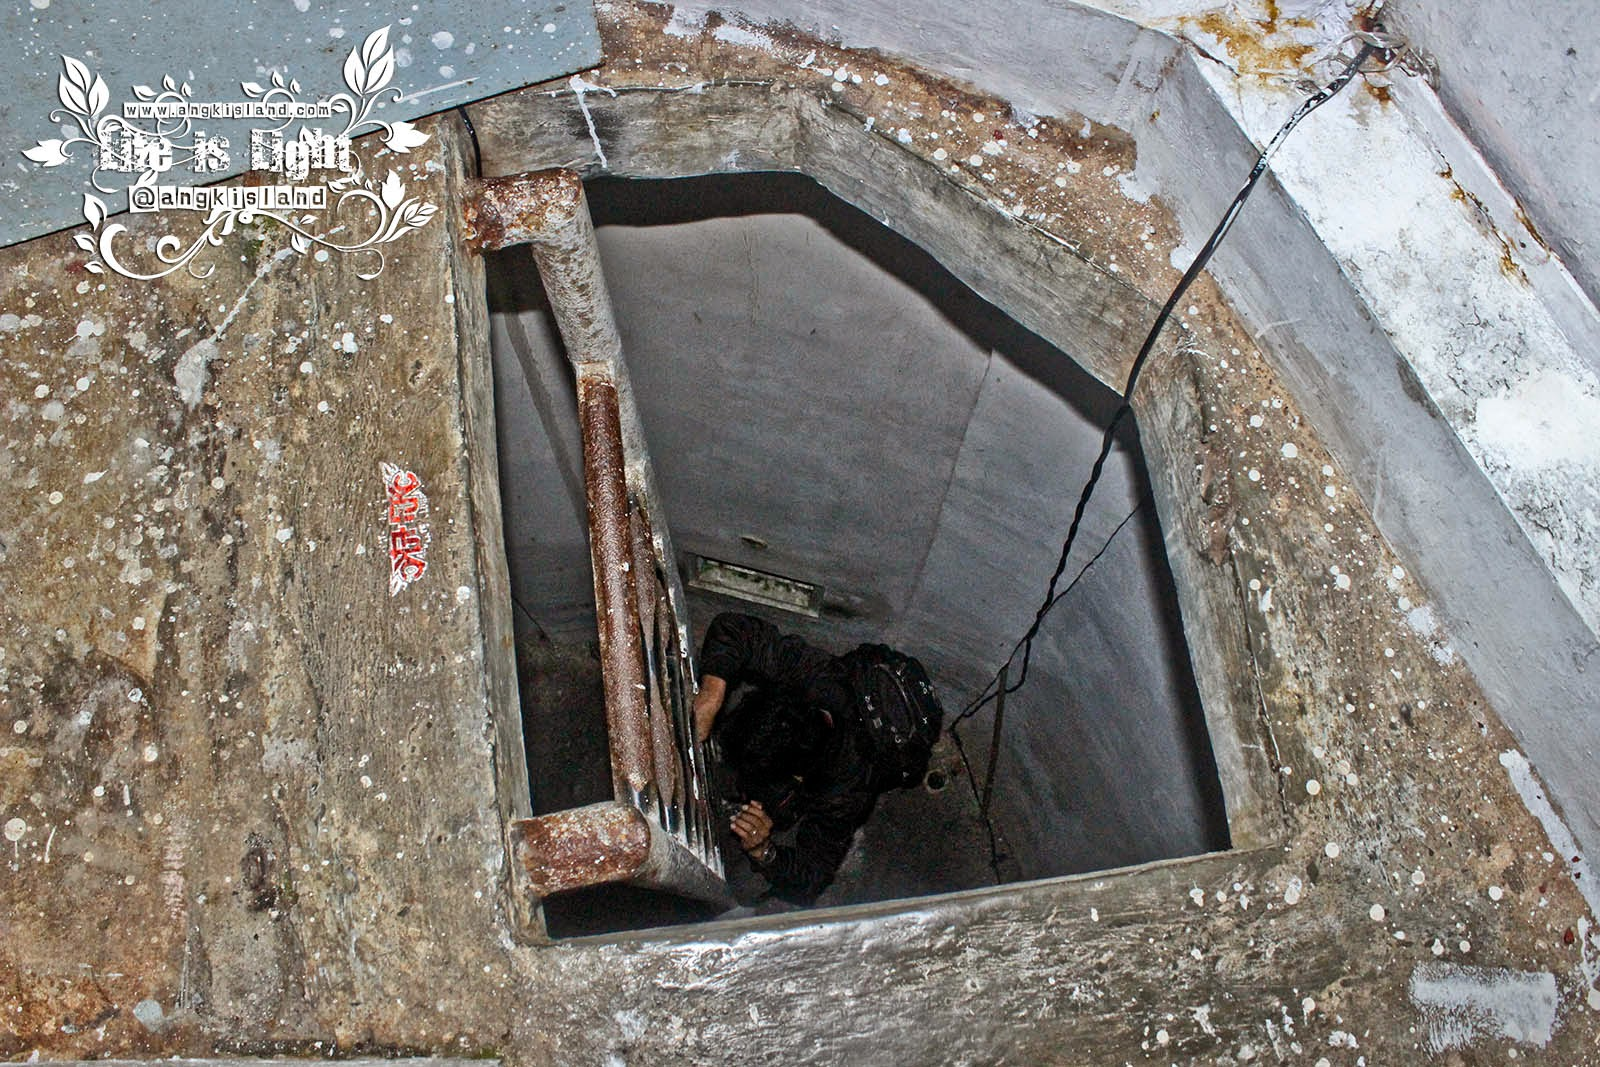 tangga mercusuar patehan